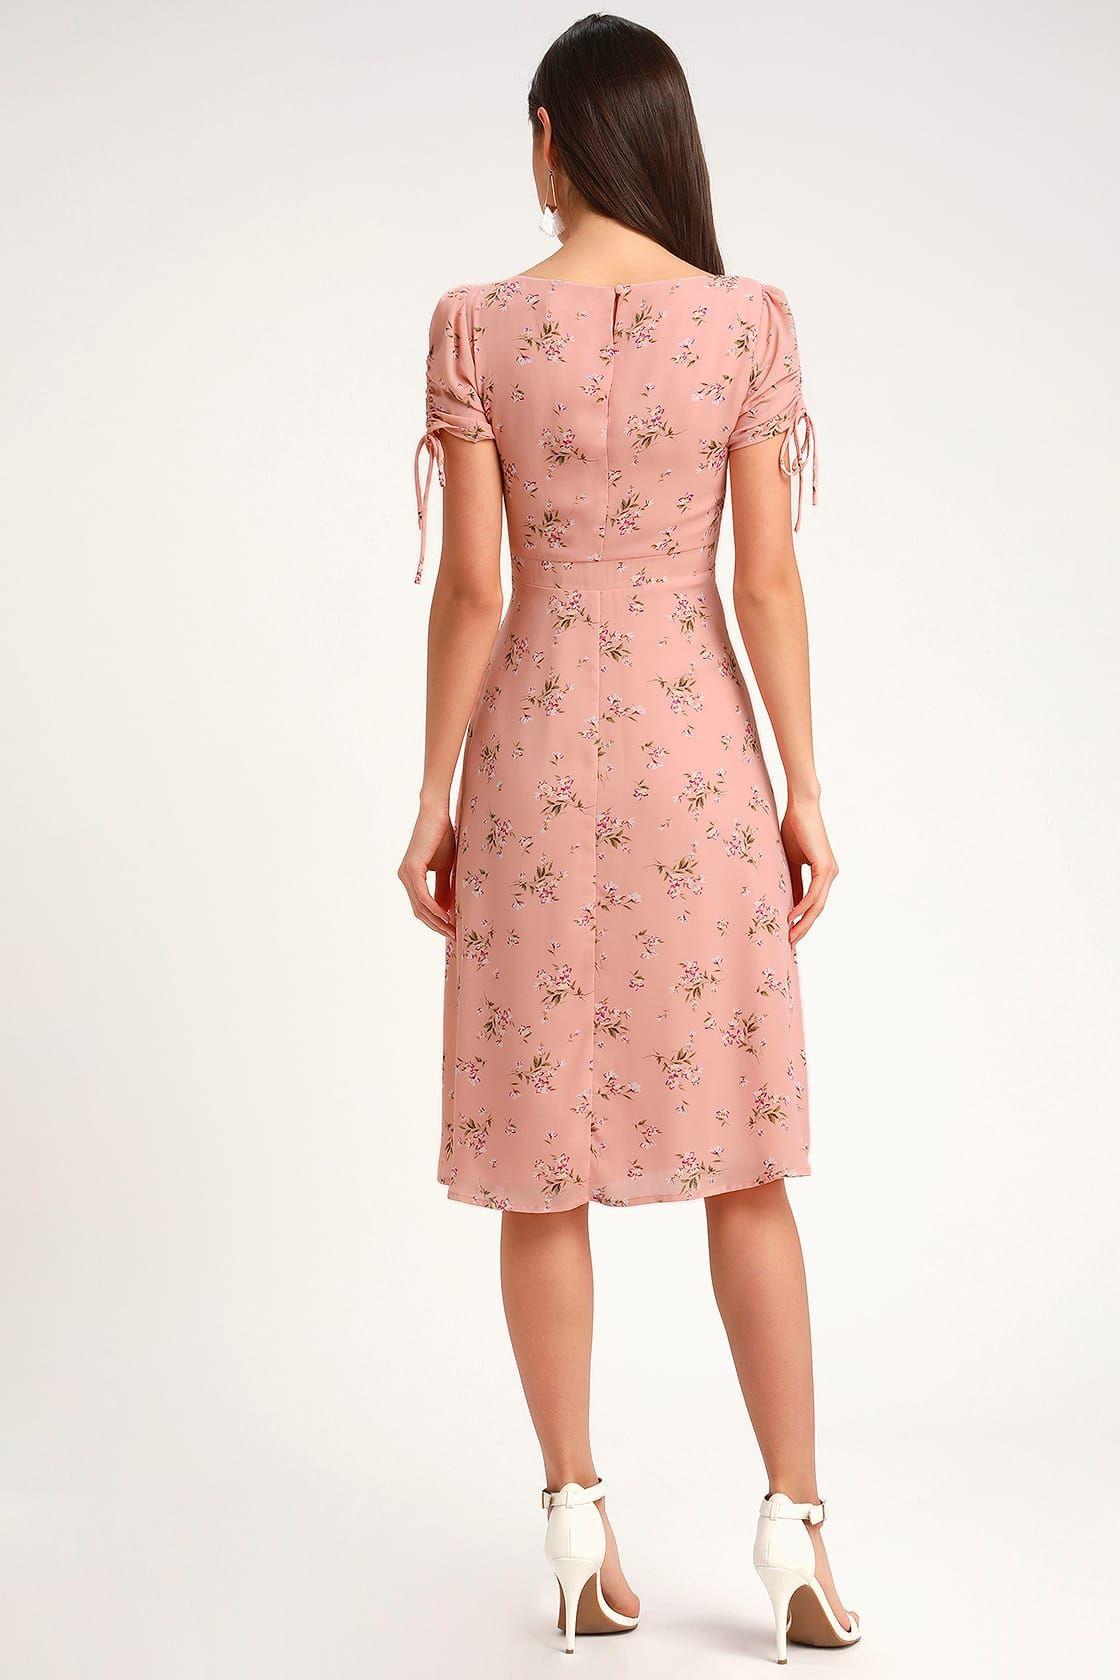 Carmel blush pink floral print short sleeve midi dress